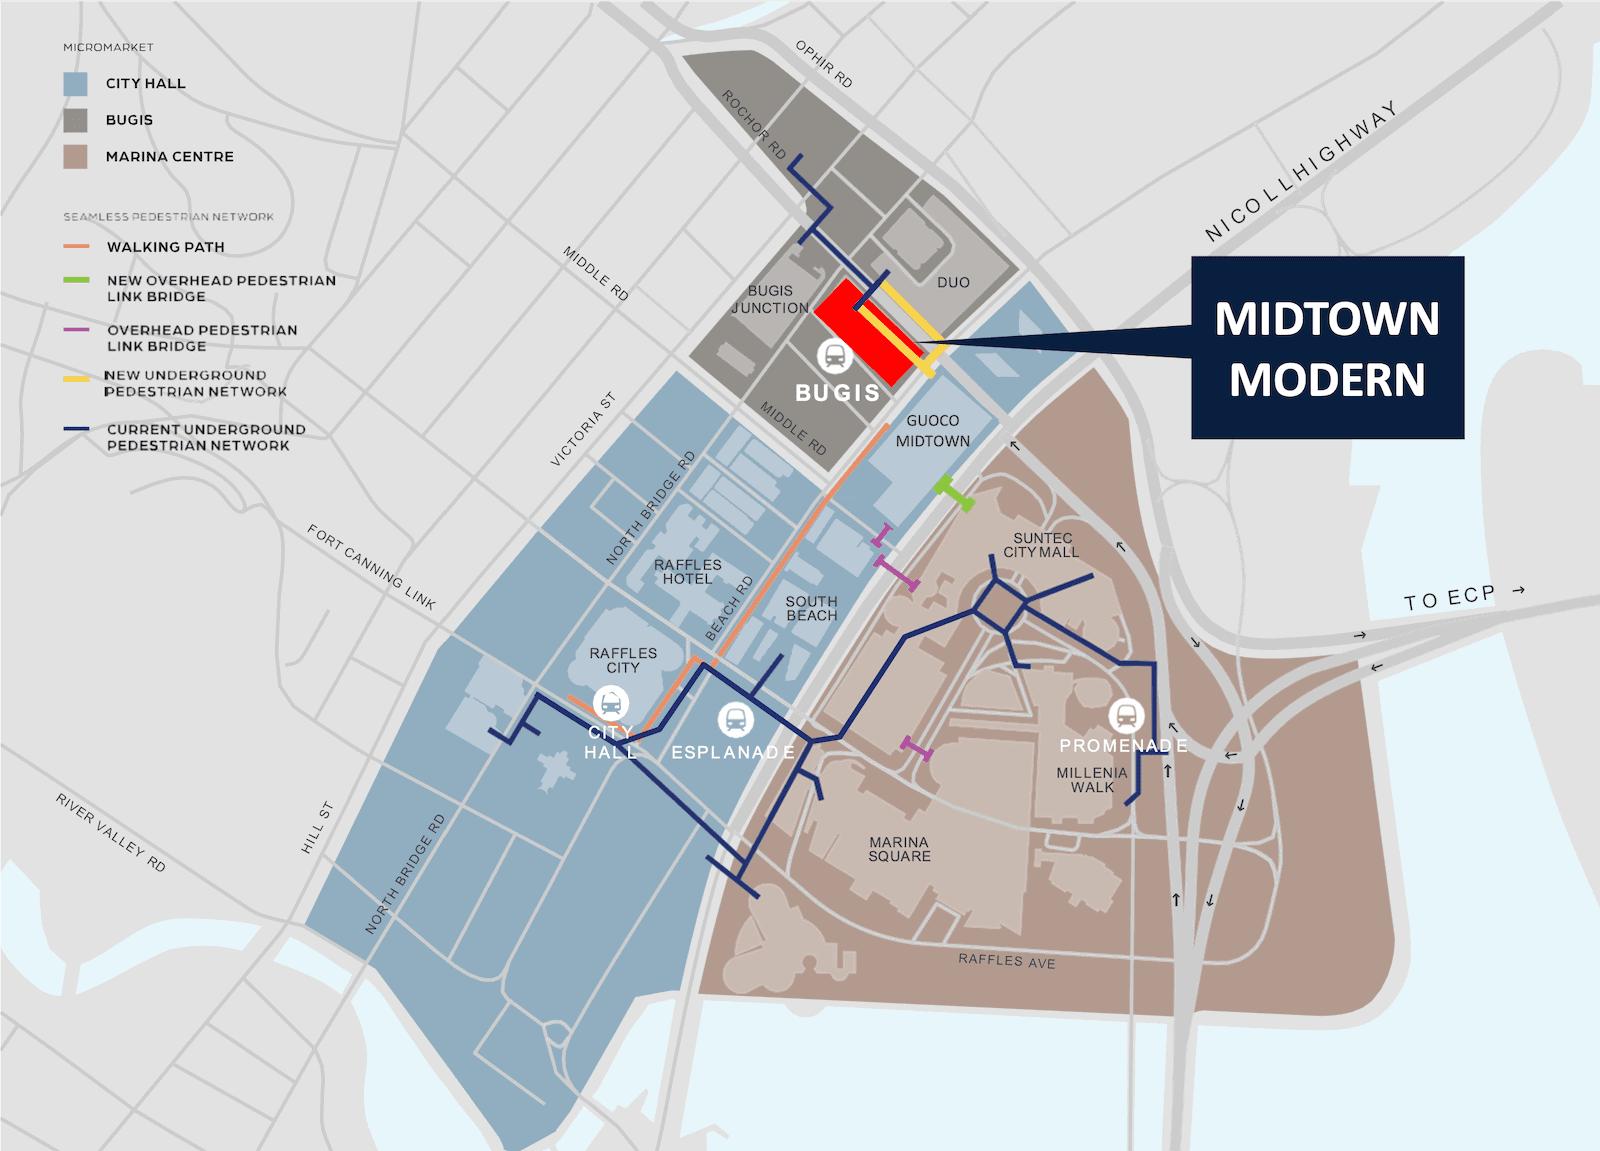 Midtown Modern District Map